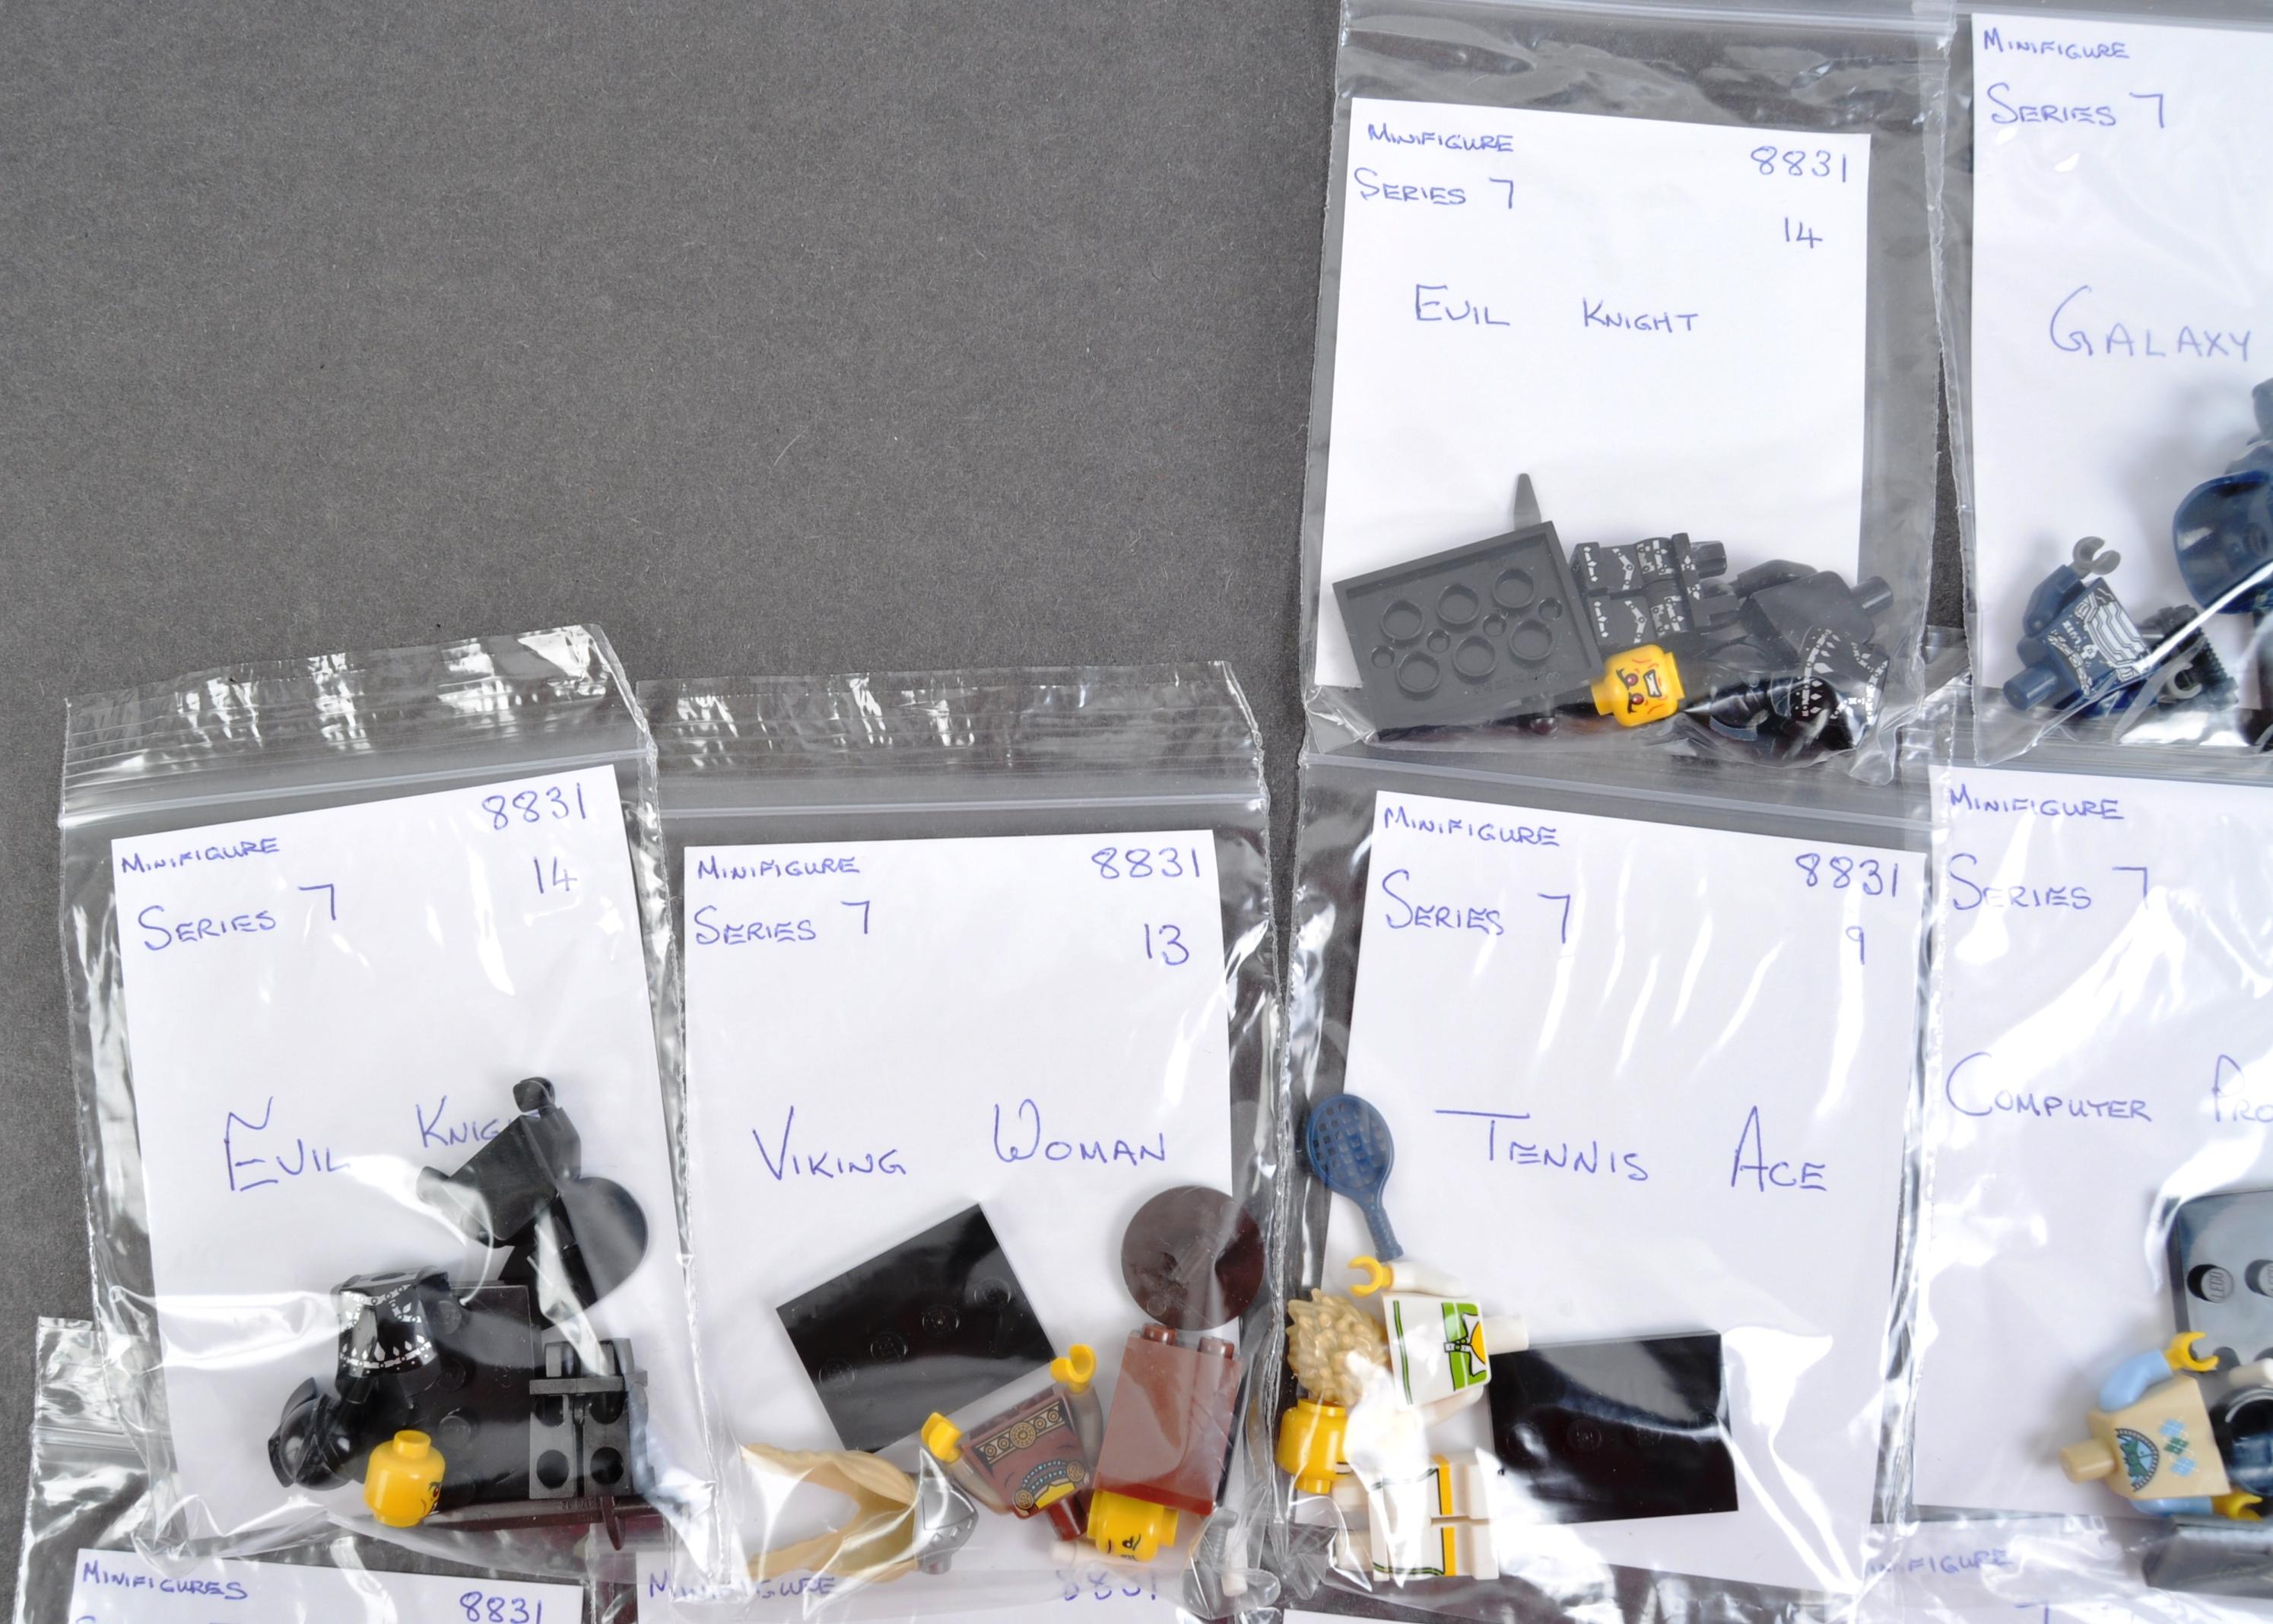 LEGO MINIFIGURES - 8831 - SERIES 7 COMPLETE MINIFIGURE SET - Image 6 of 6